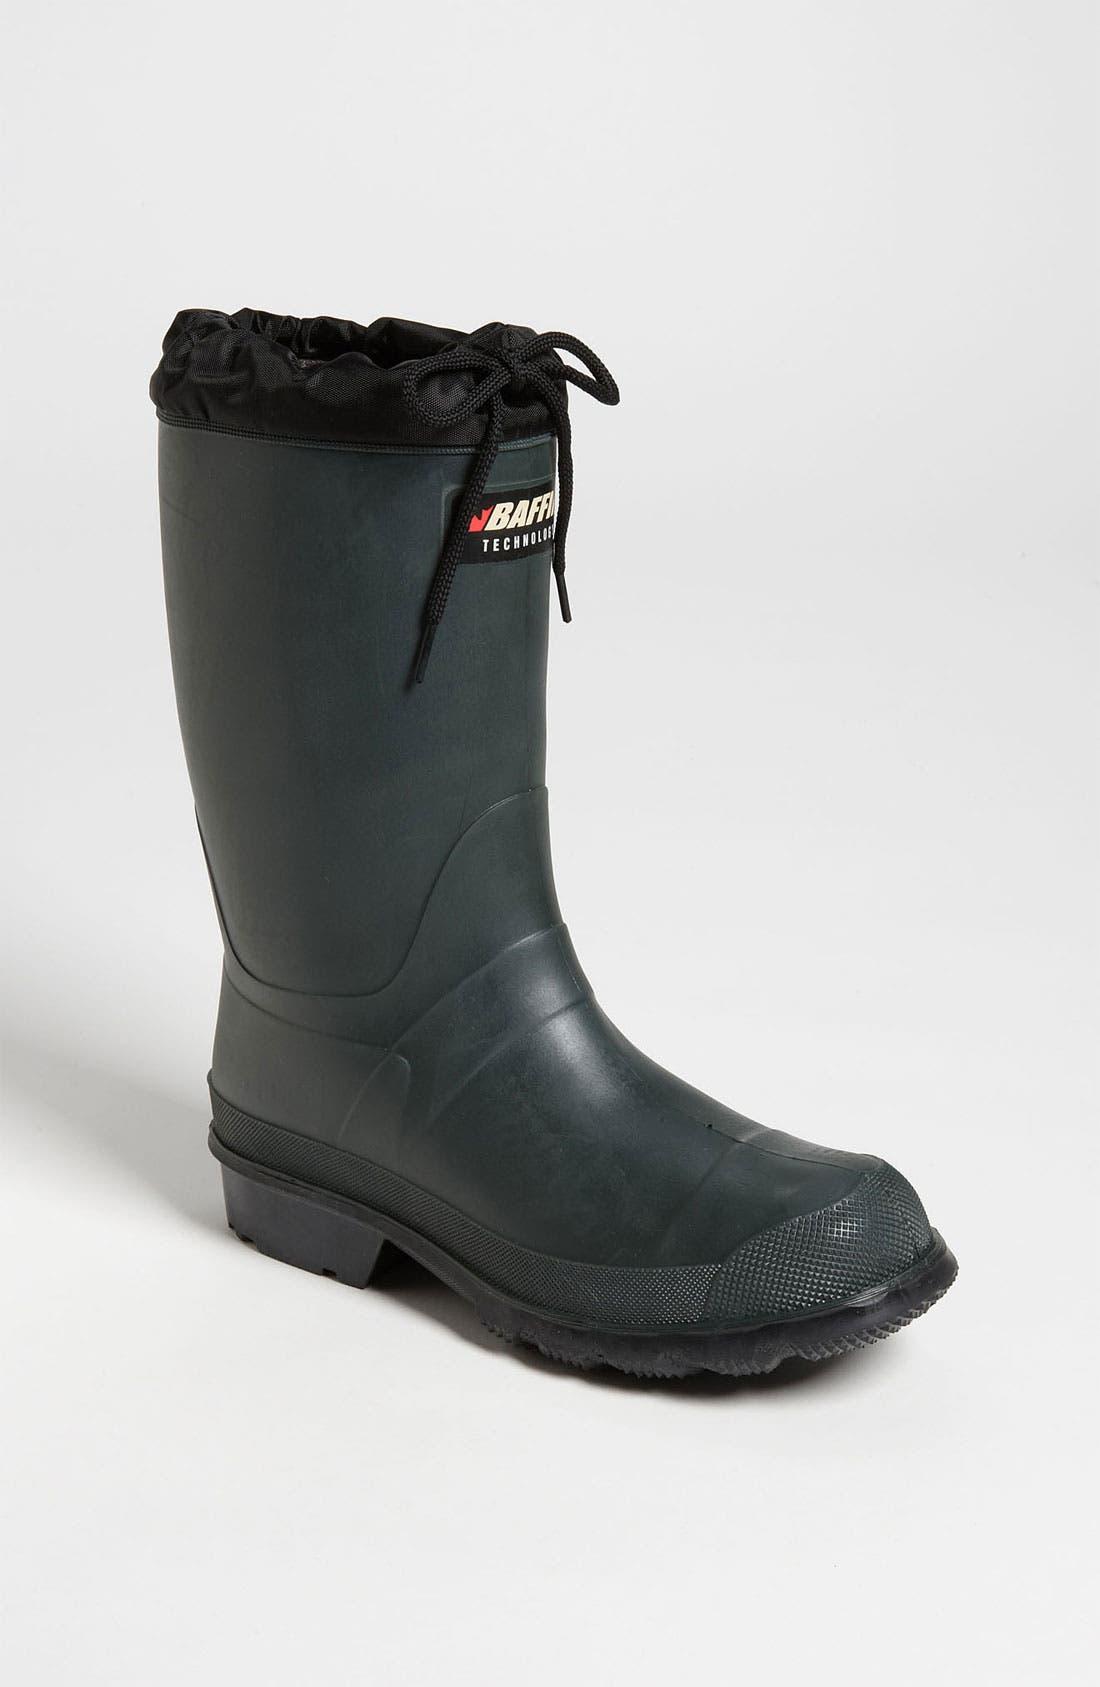 Main Image - Baffin 'Hunter' Snow Boot